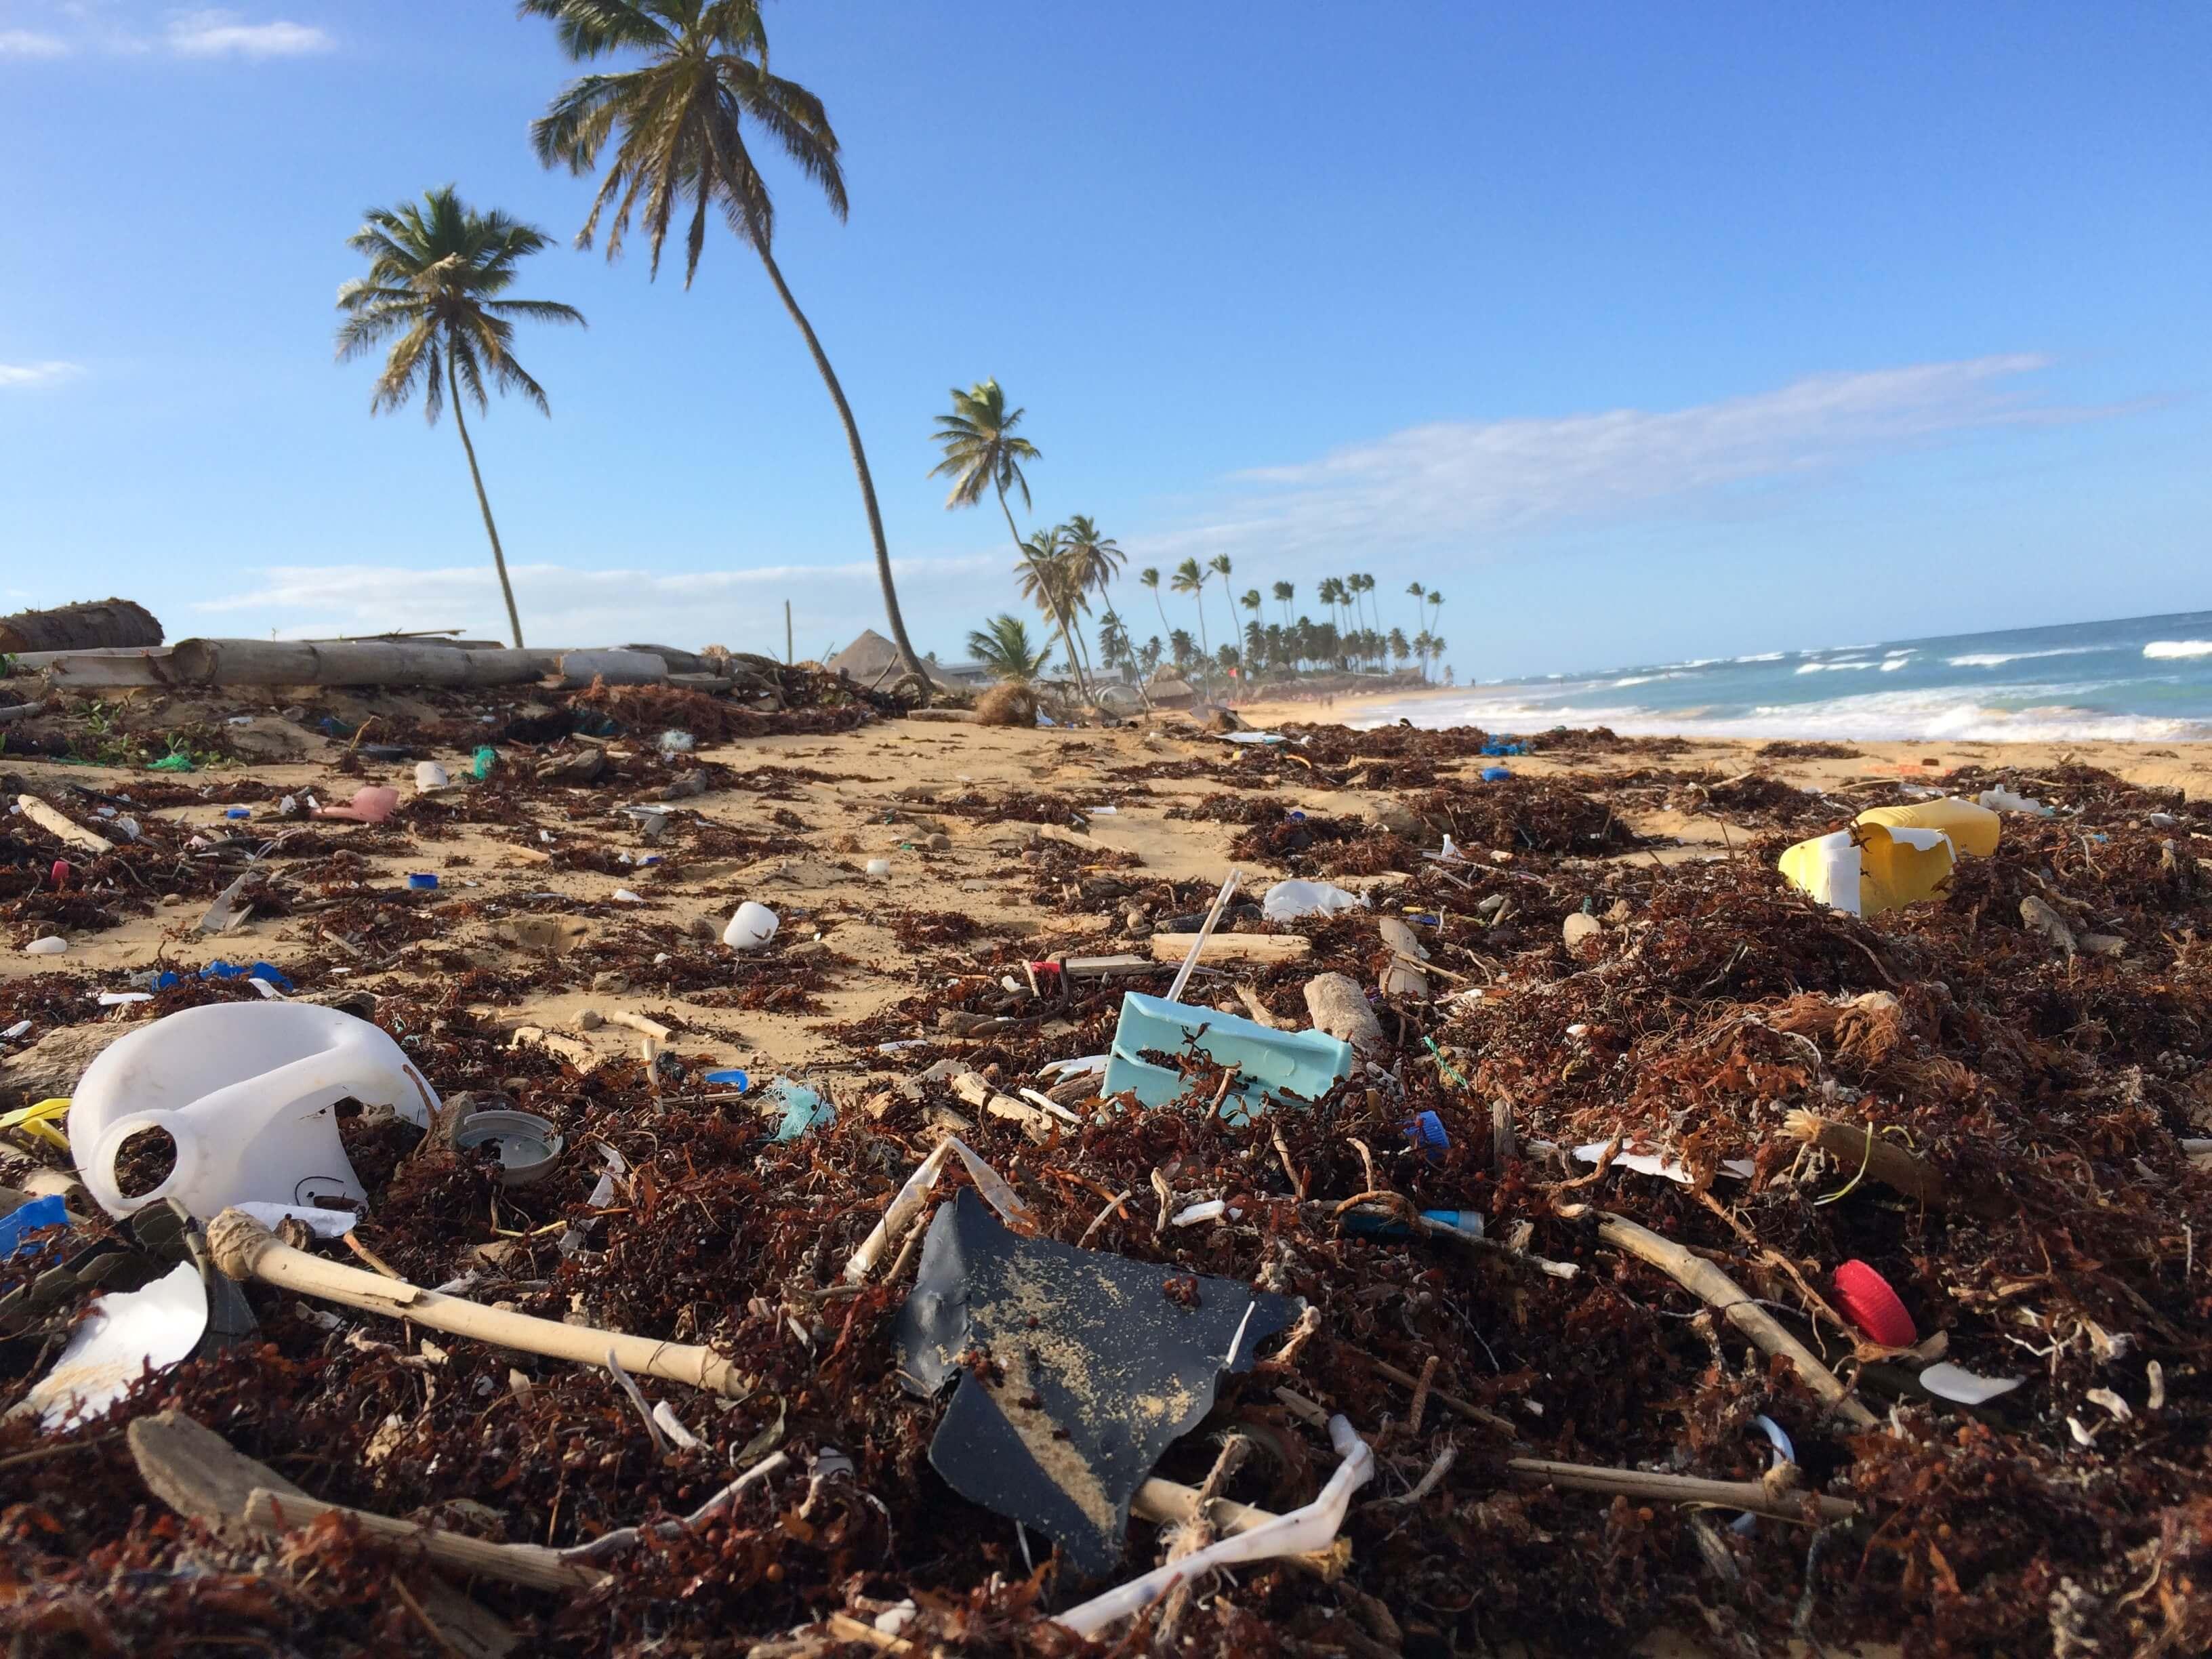 Plastic trash at the beach